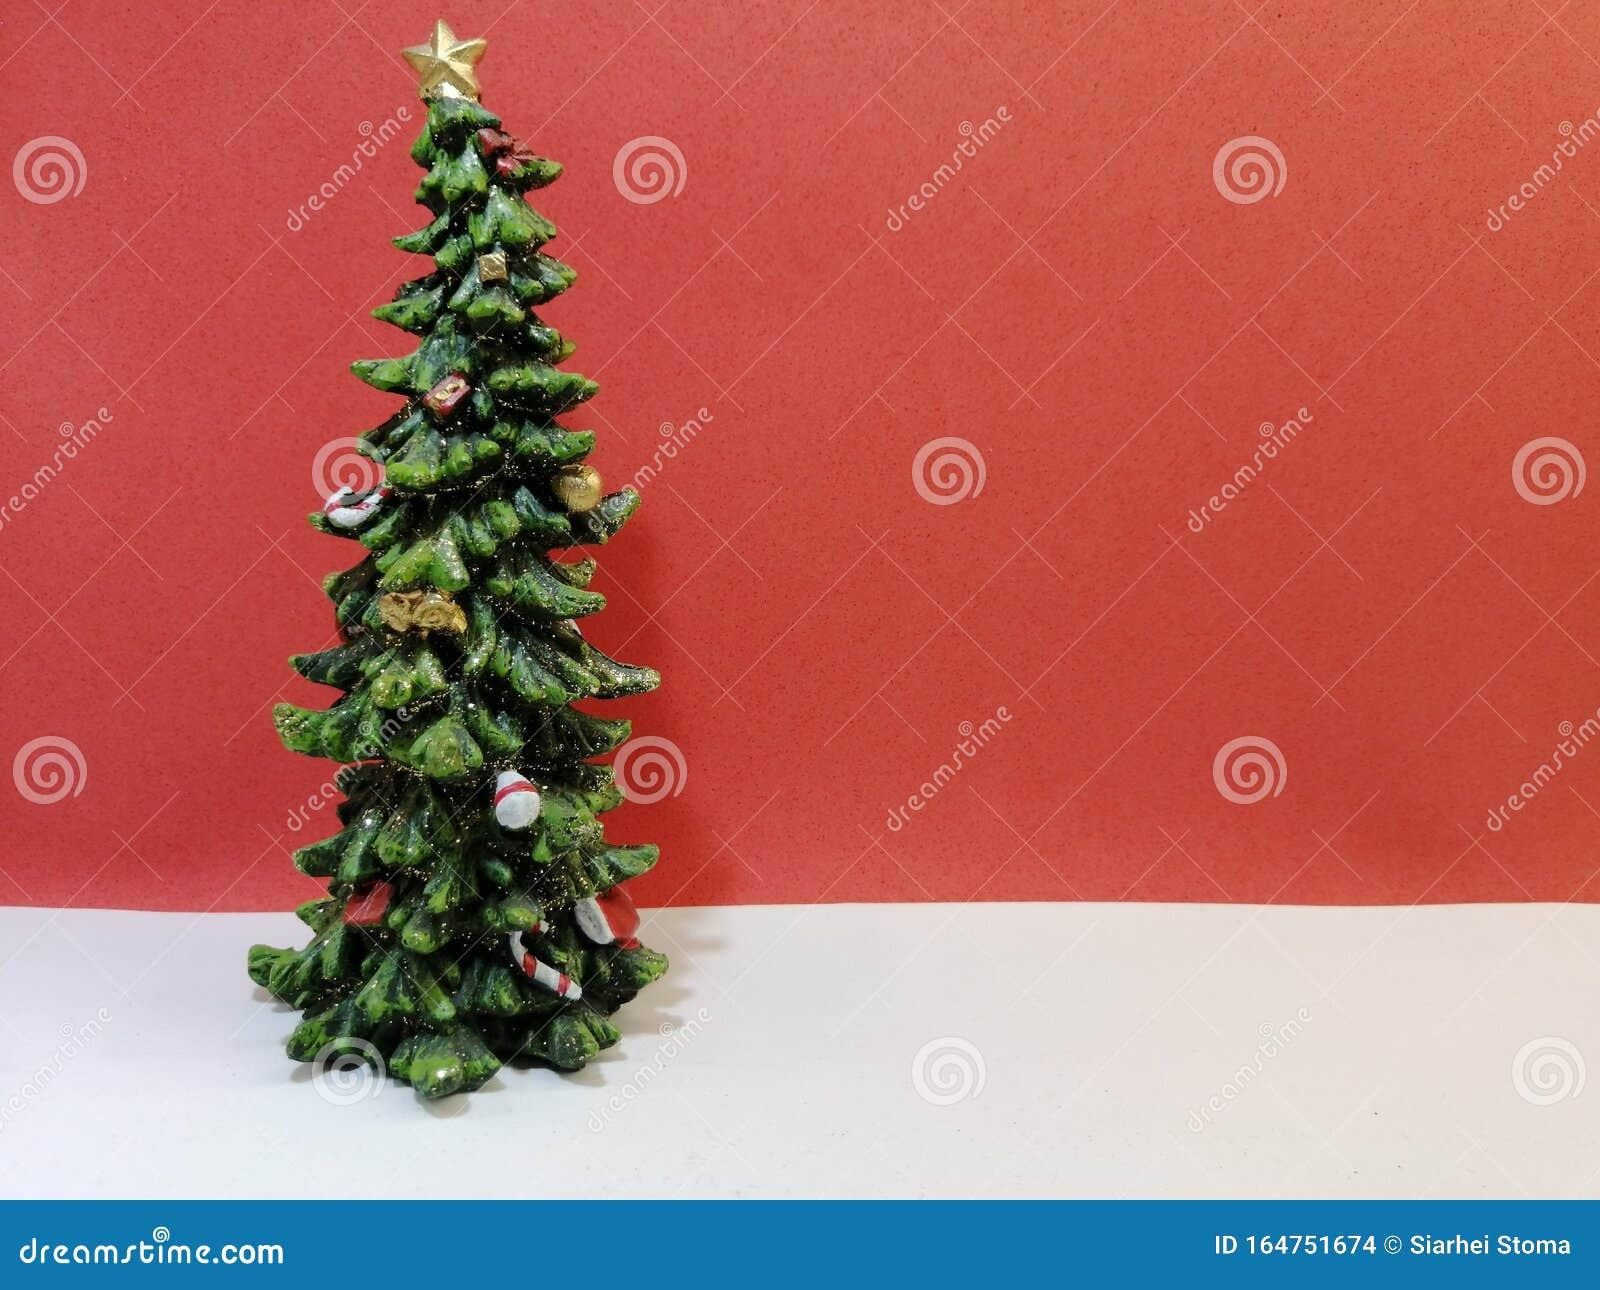 Small Elegant Christmas Tree On Red Background Stock Photo Image Of Festive Interior 164751674